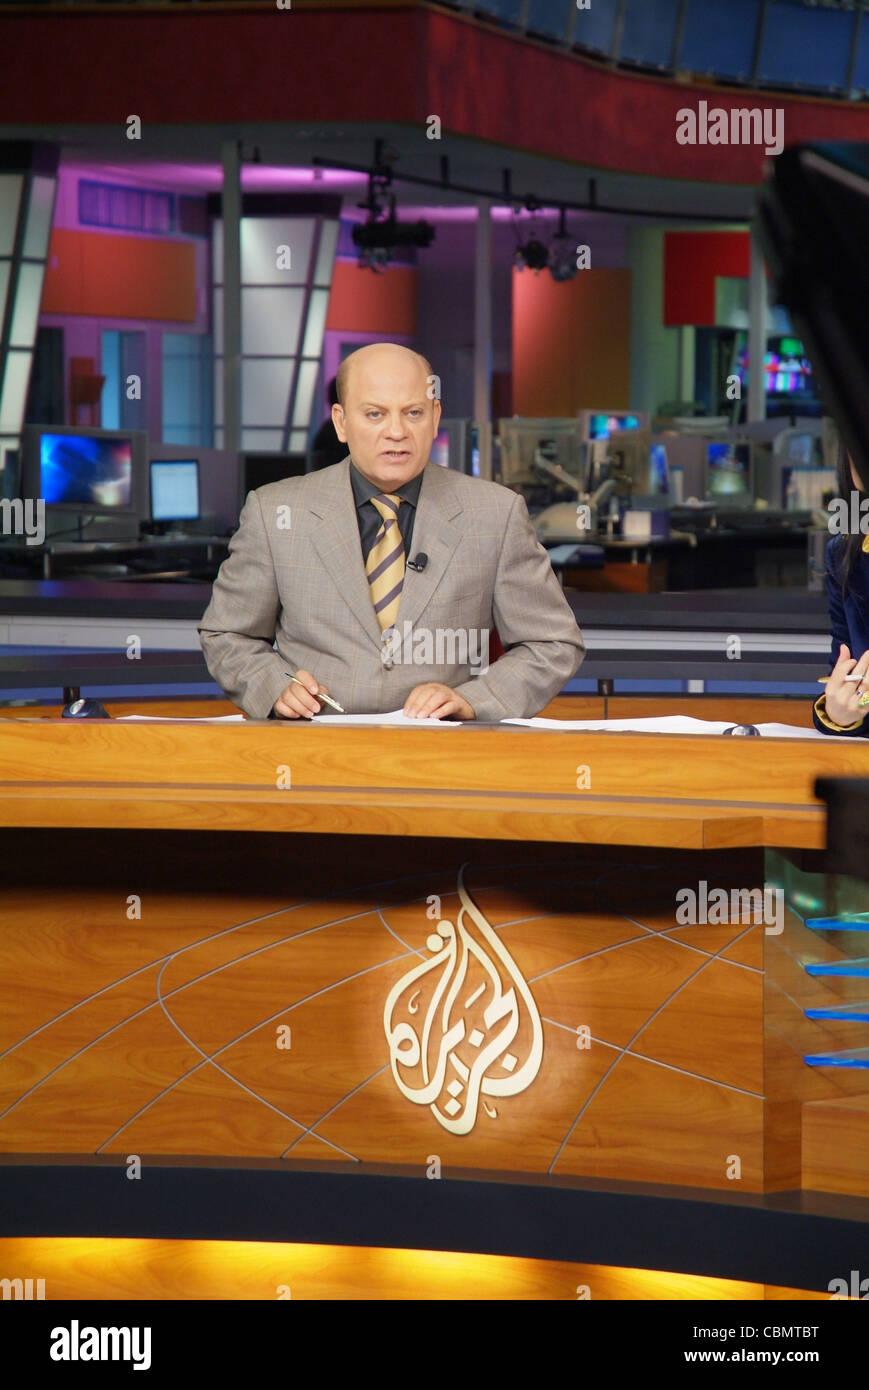 Arab News Presenter Stock Photos & Arab News Presenter Stock